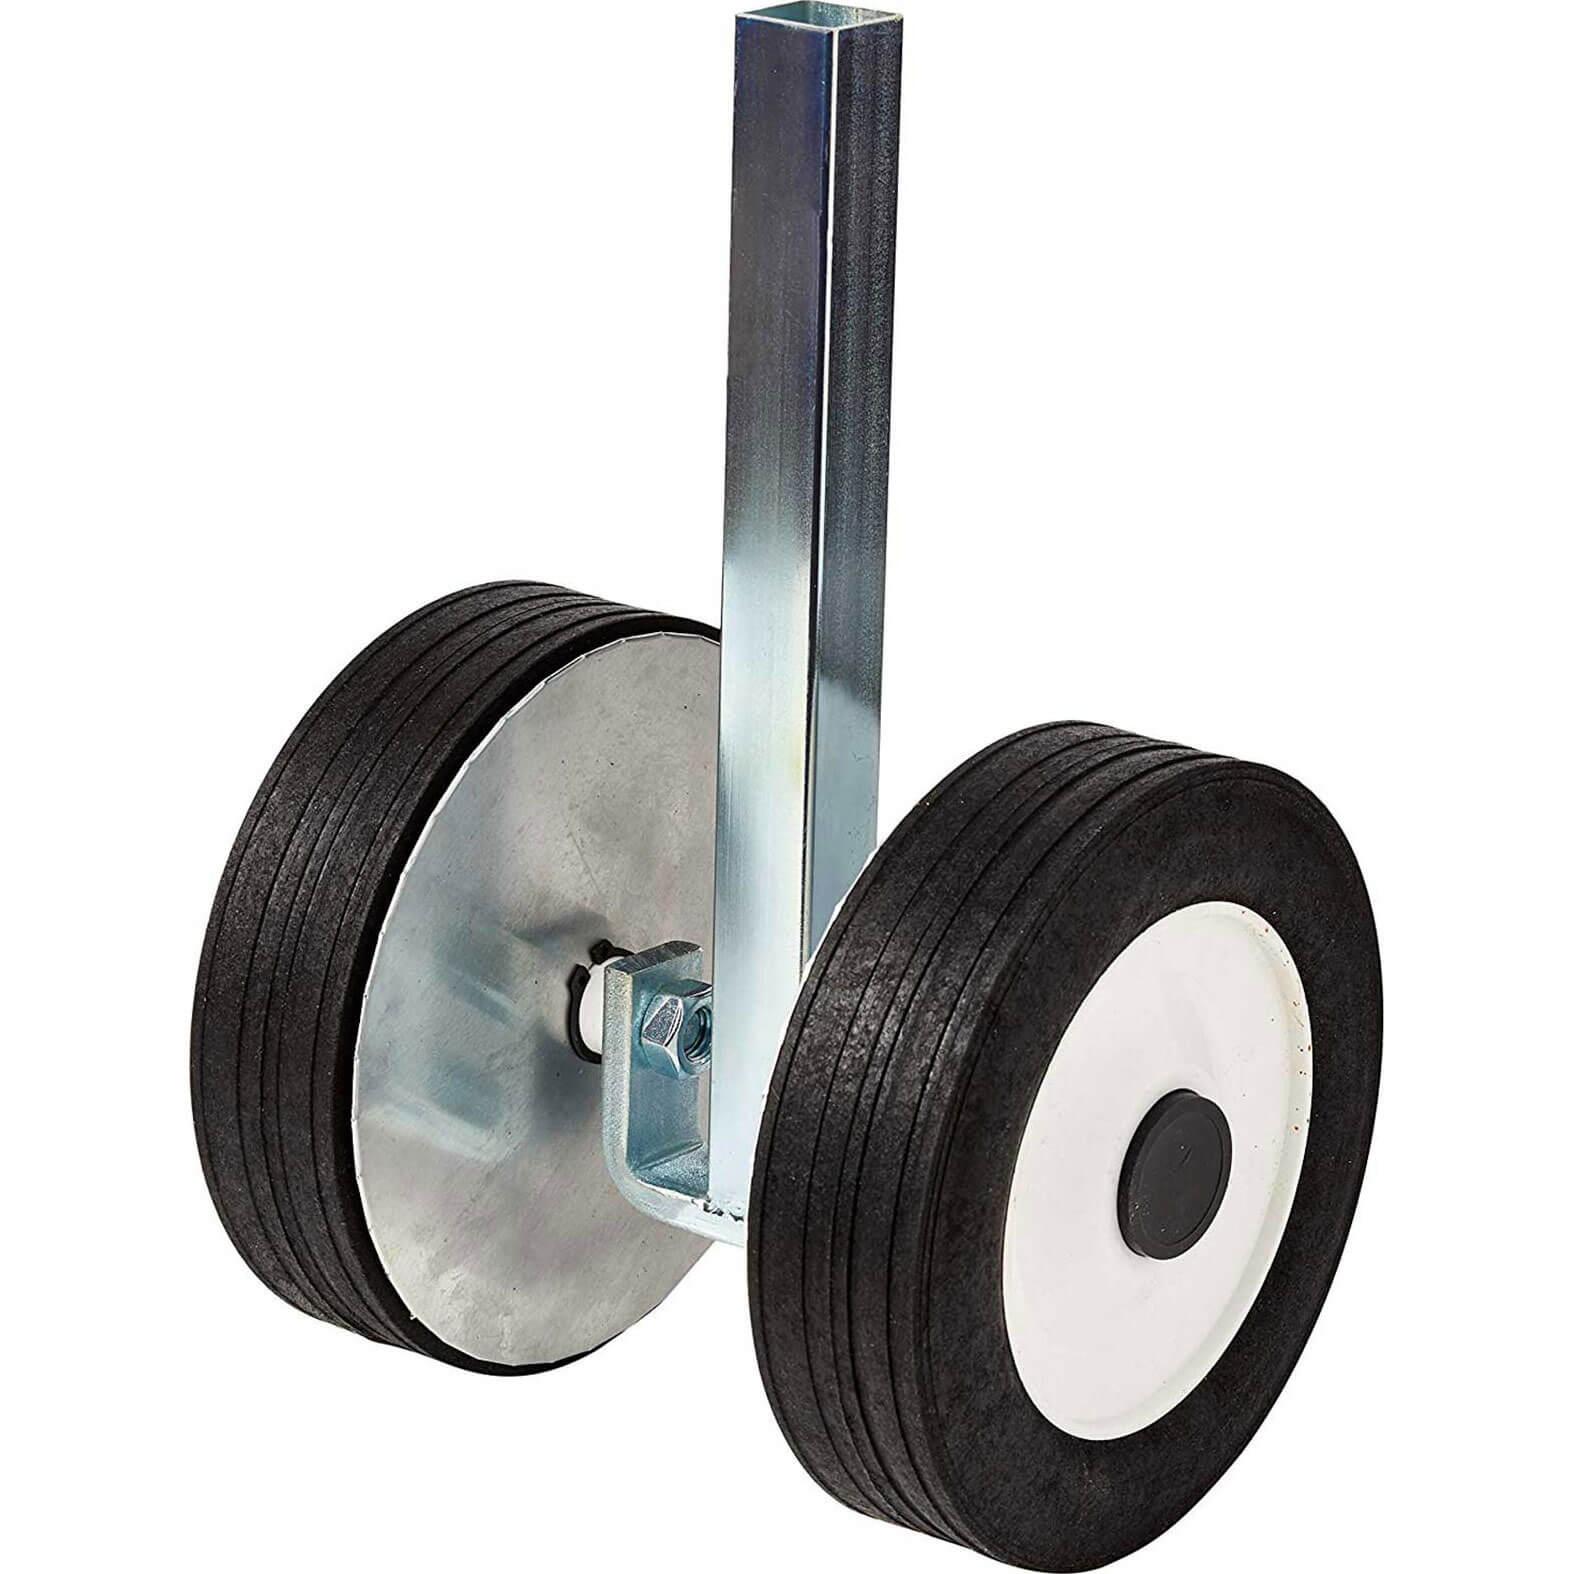 Image of Rust Oleum 2 Wheel Line Marking Aerosol Applicator